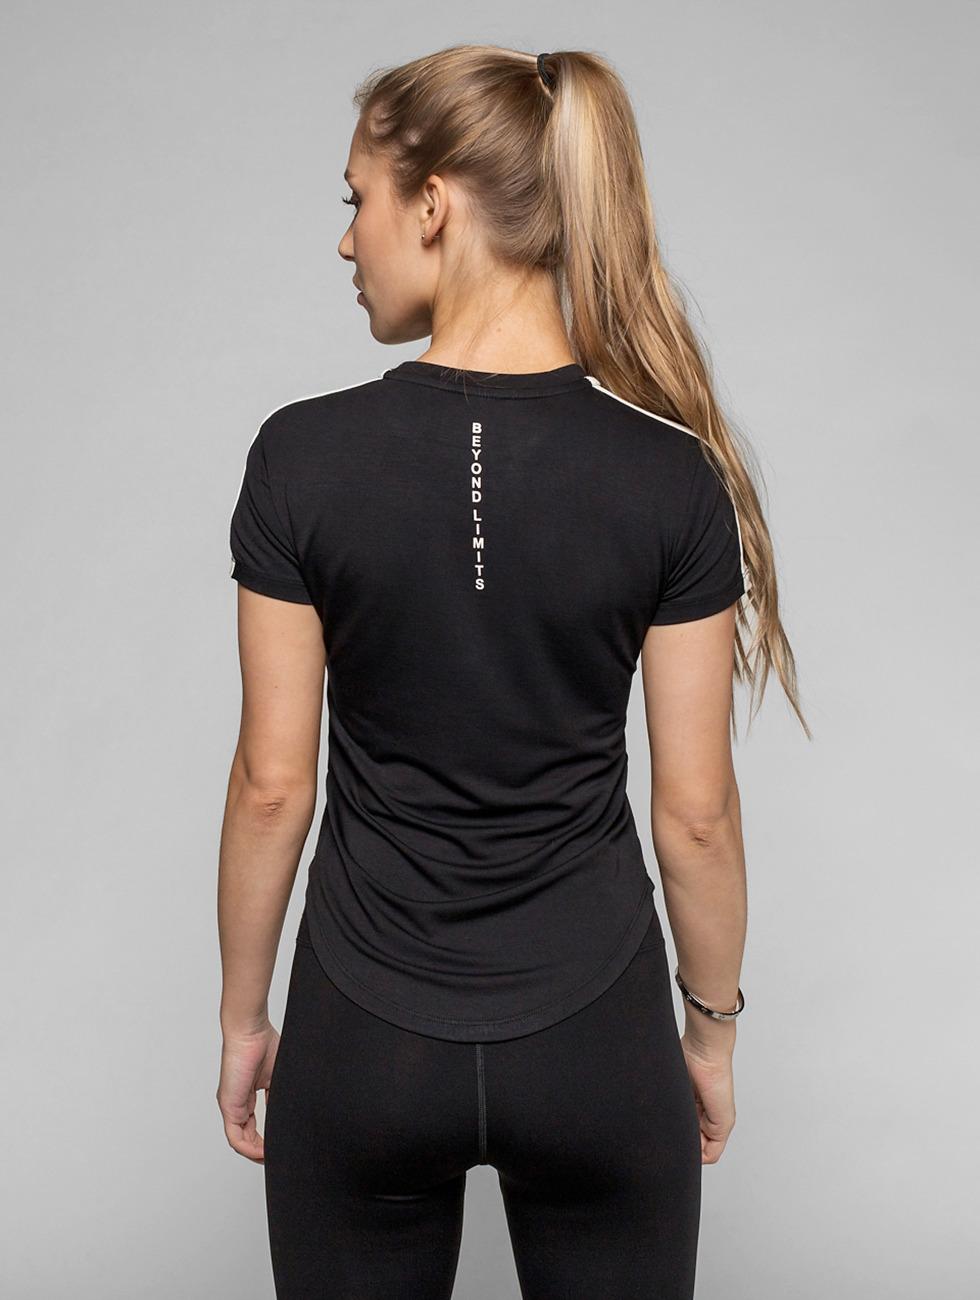 Beyond Limits T-Shirt Statement noir